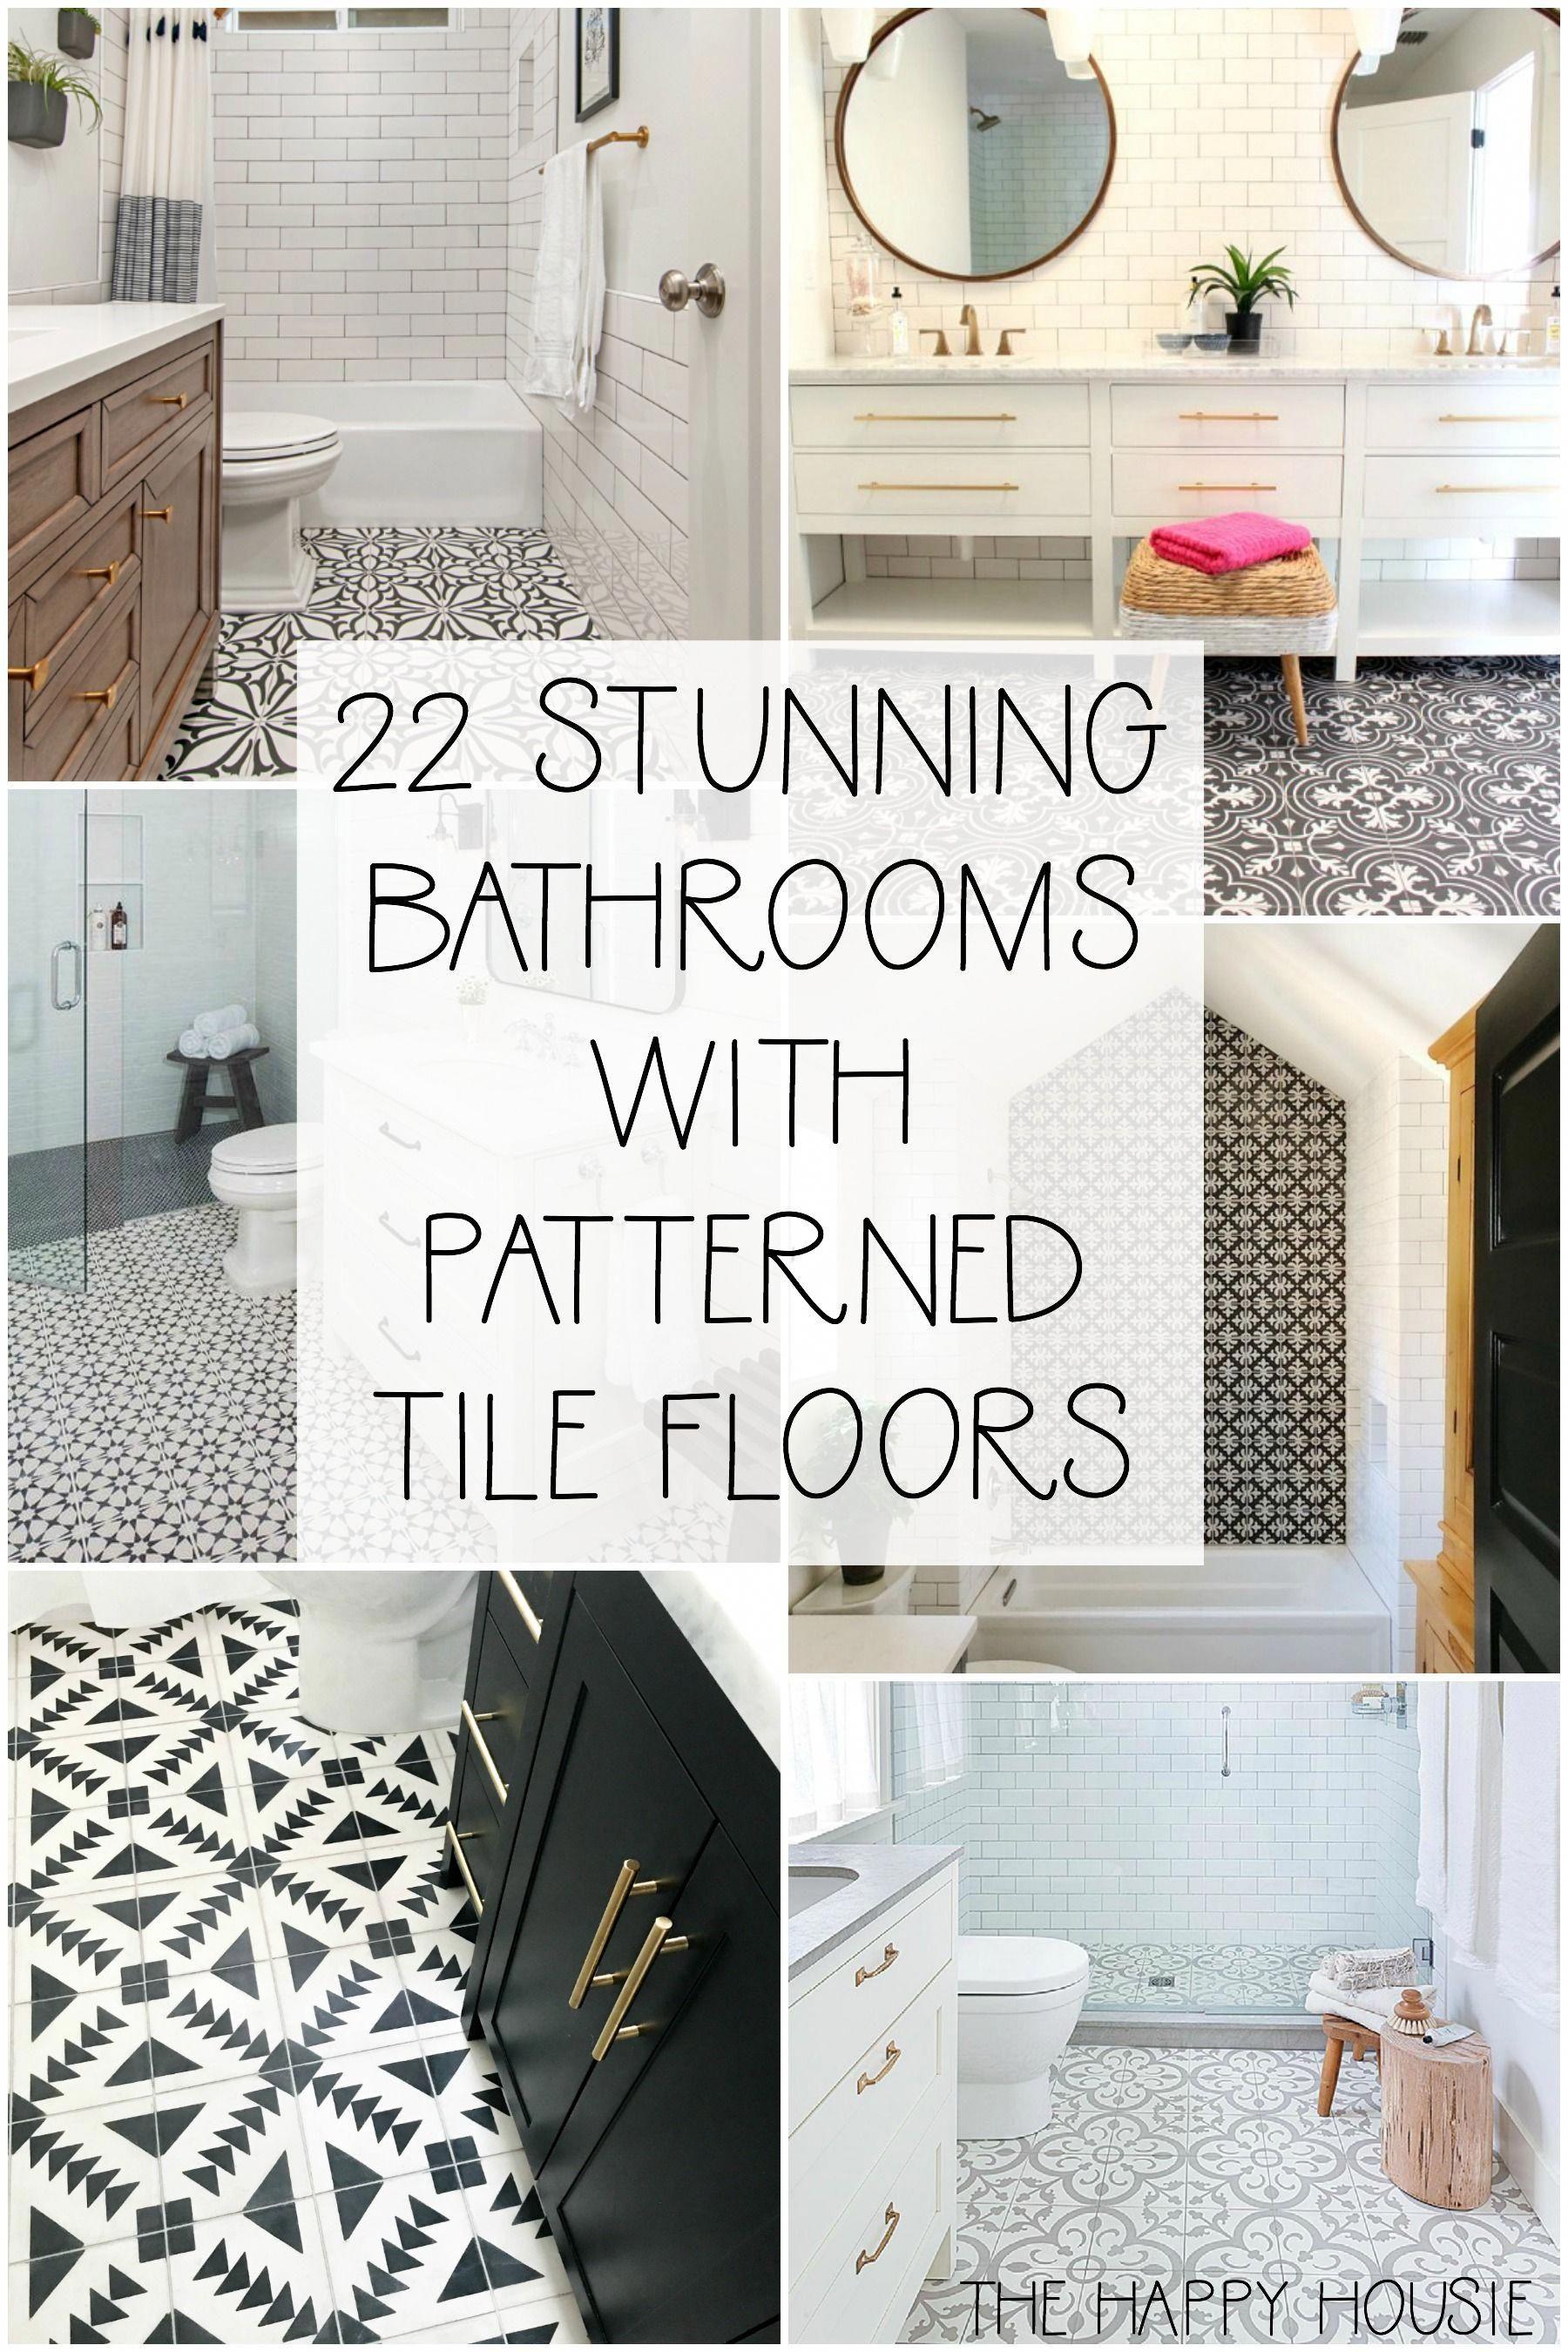 Patterned Tile Floors